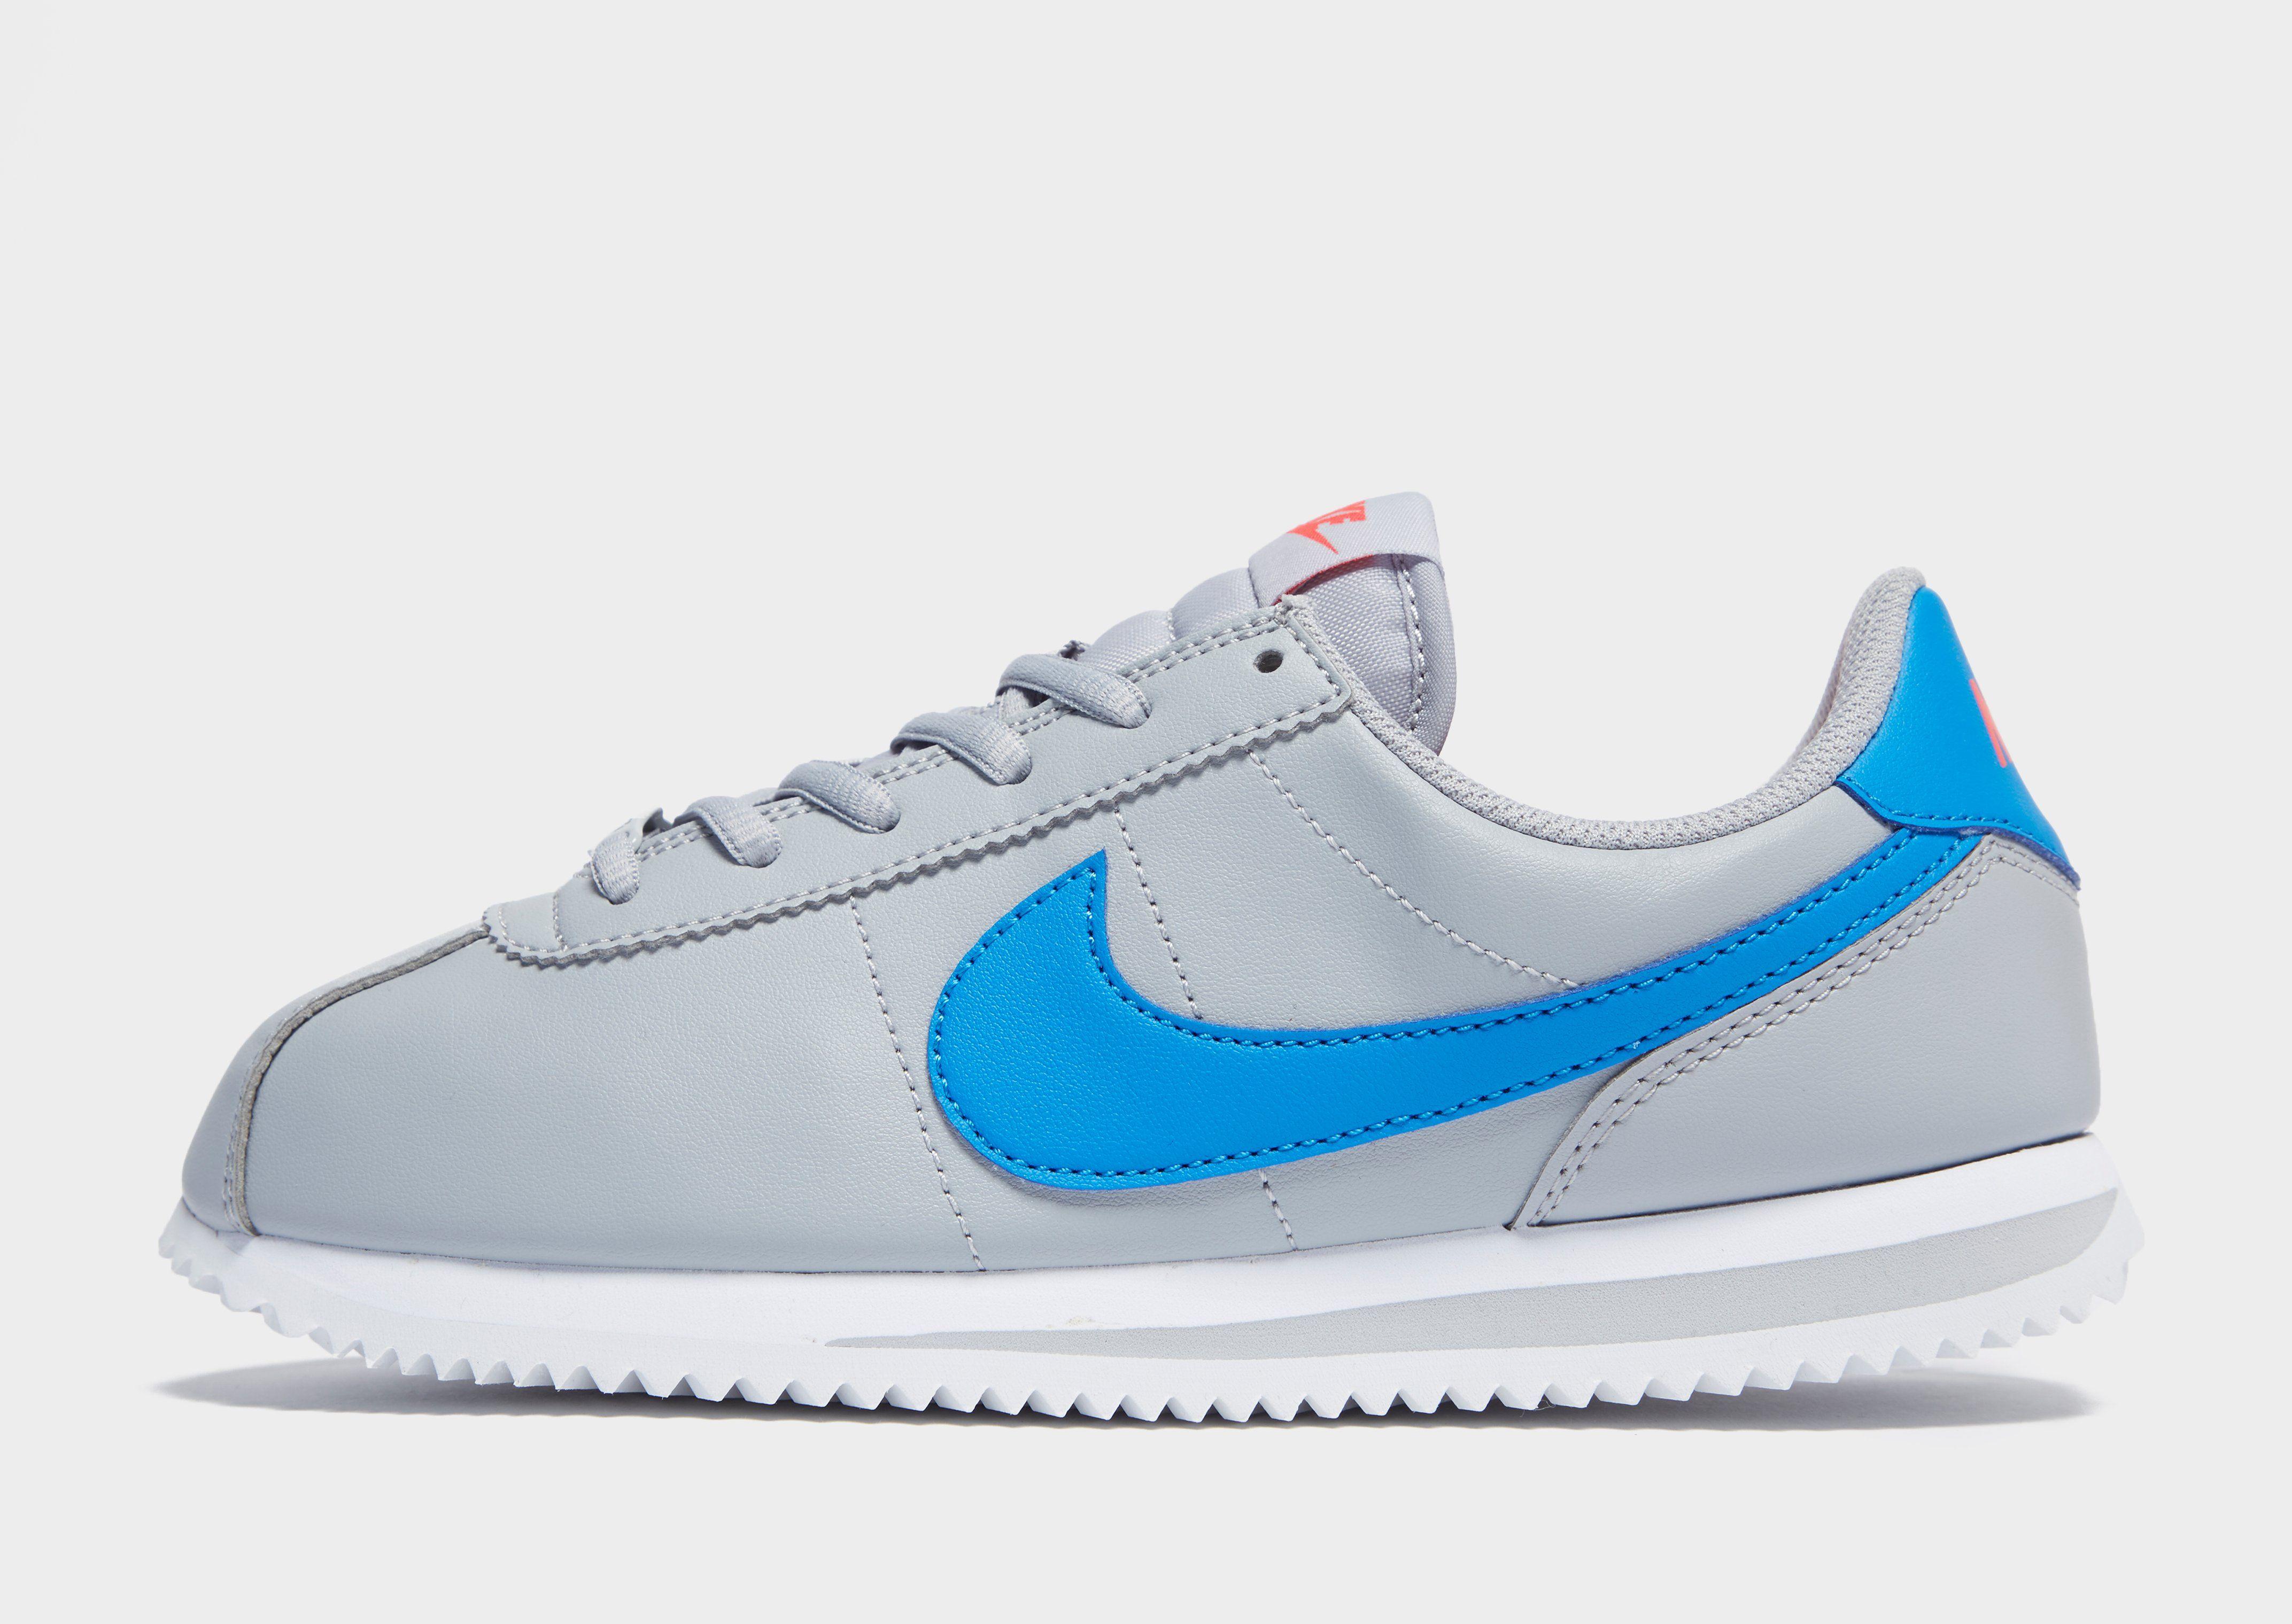 newest 40642 bdc77 Nike Cortez Basic TXT VDAY Older Kids' Shoe | JD Sports